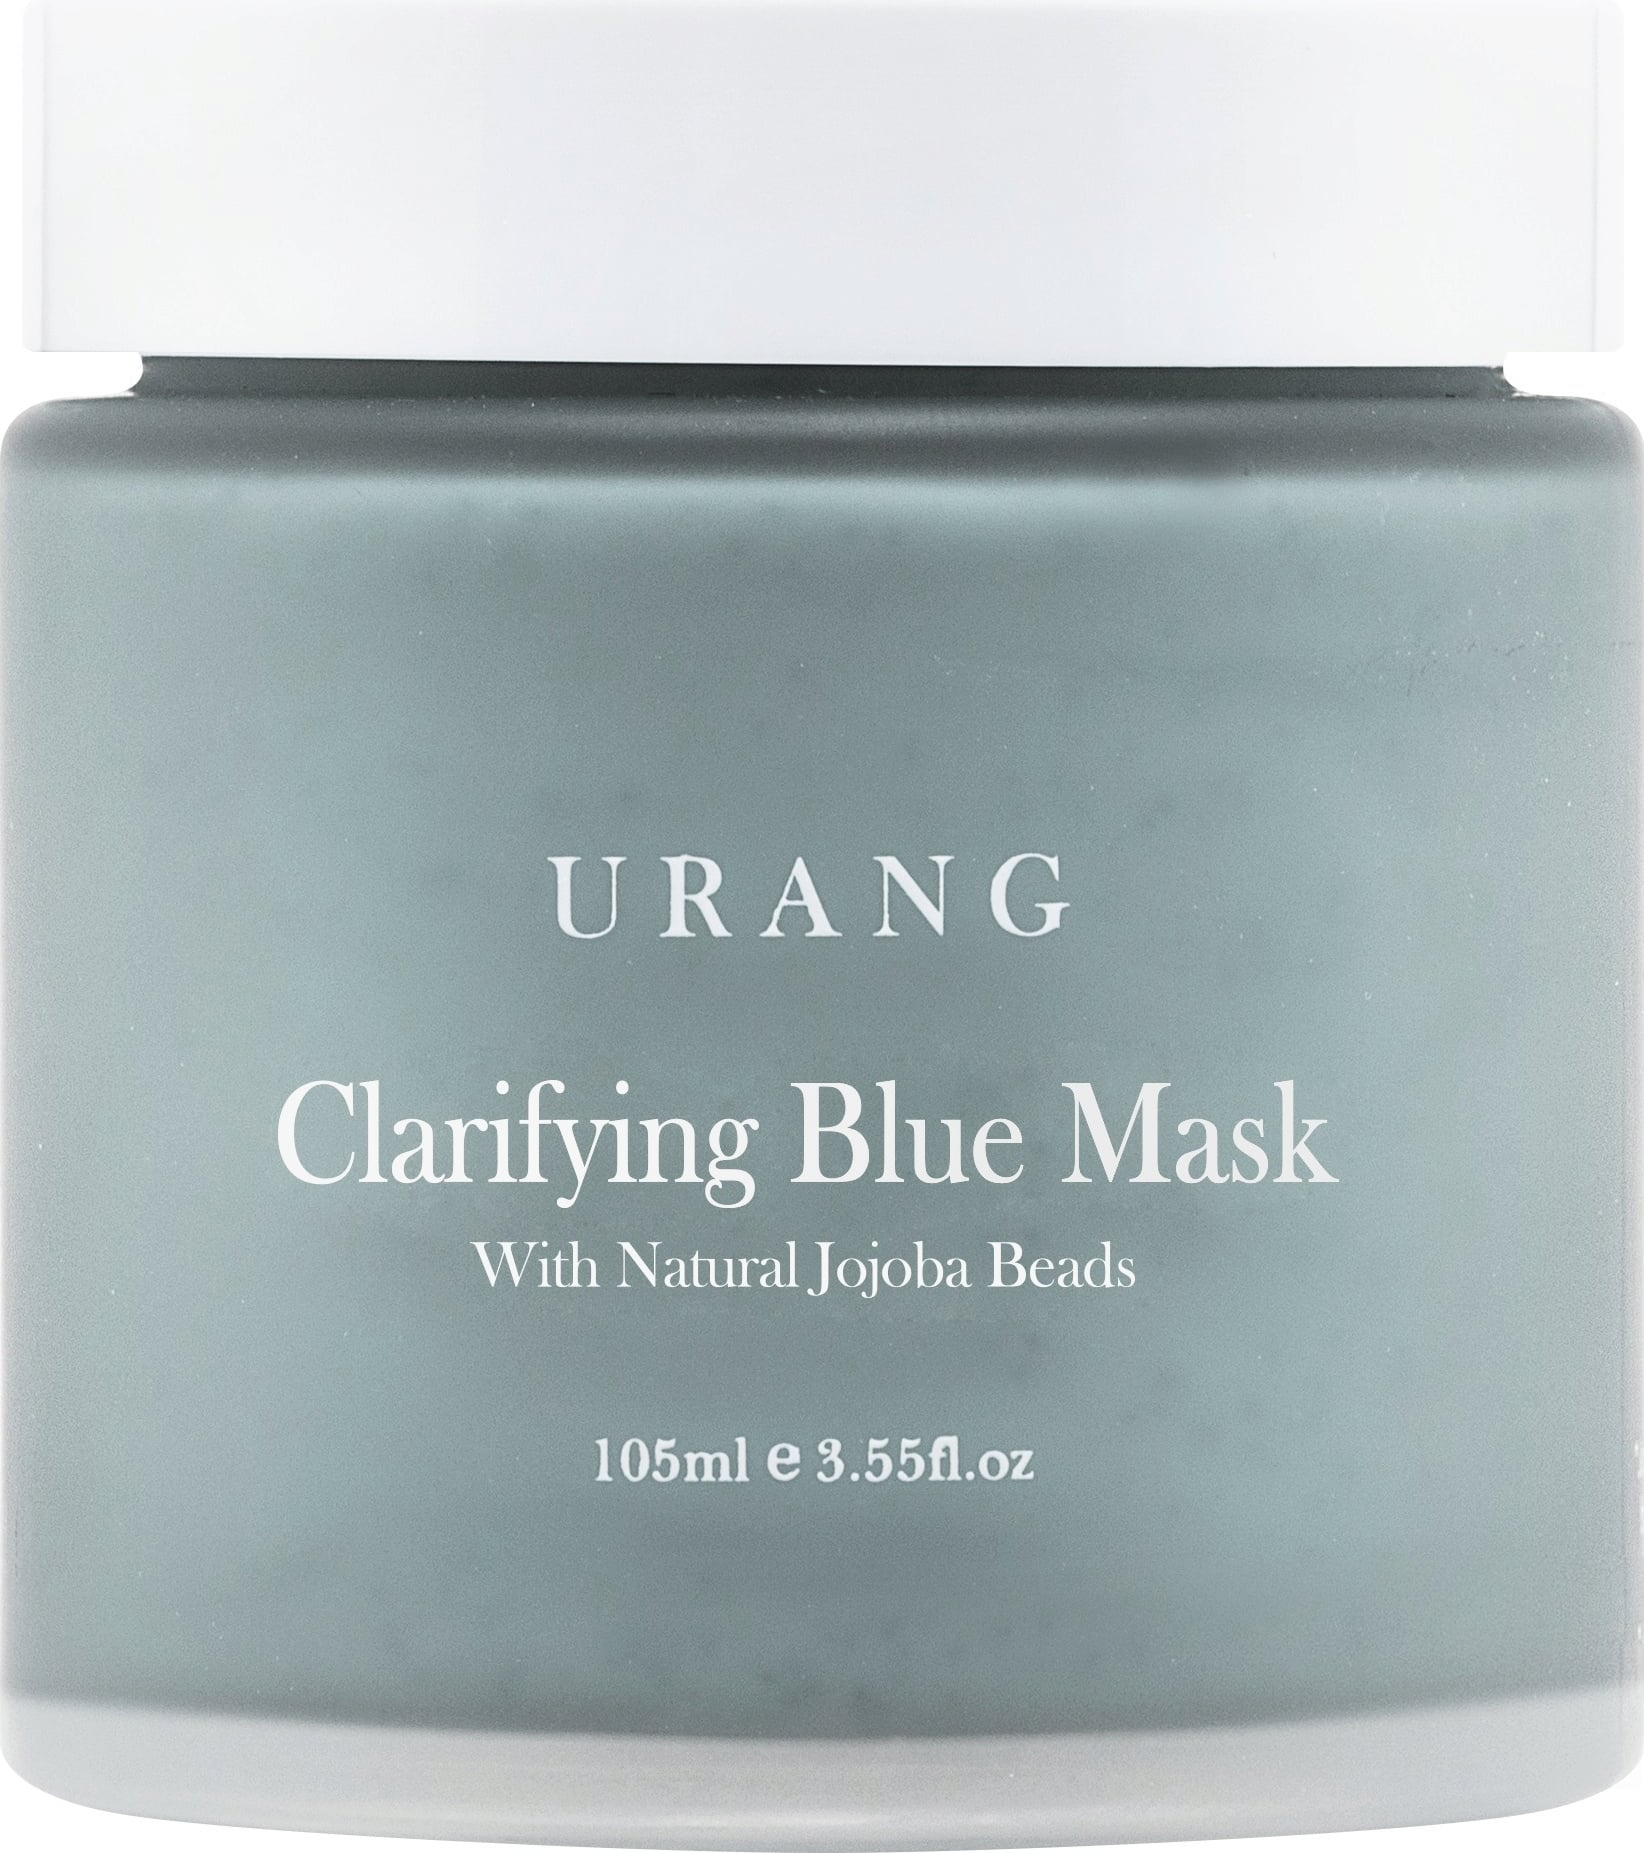 URANG Clarifying Blue Mask With Natural Jojoba Beads